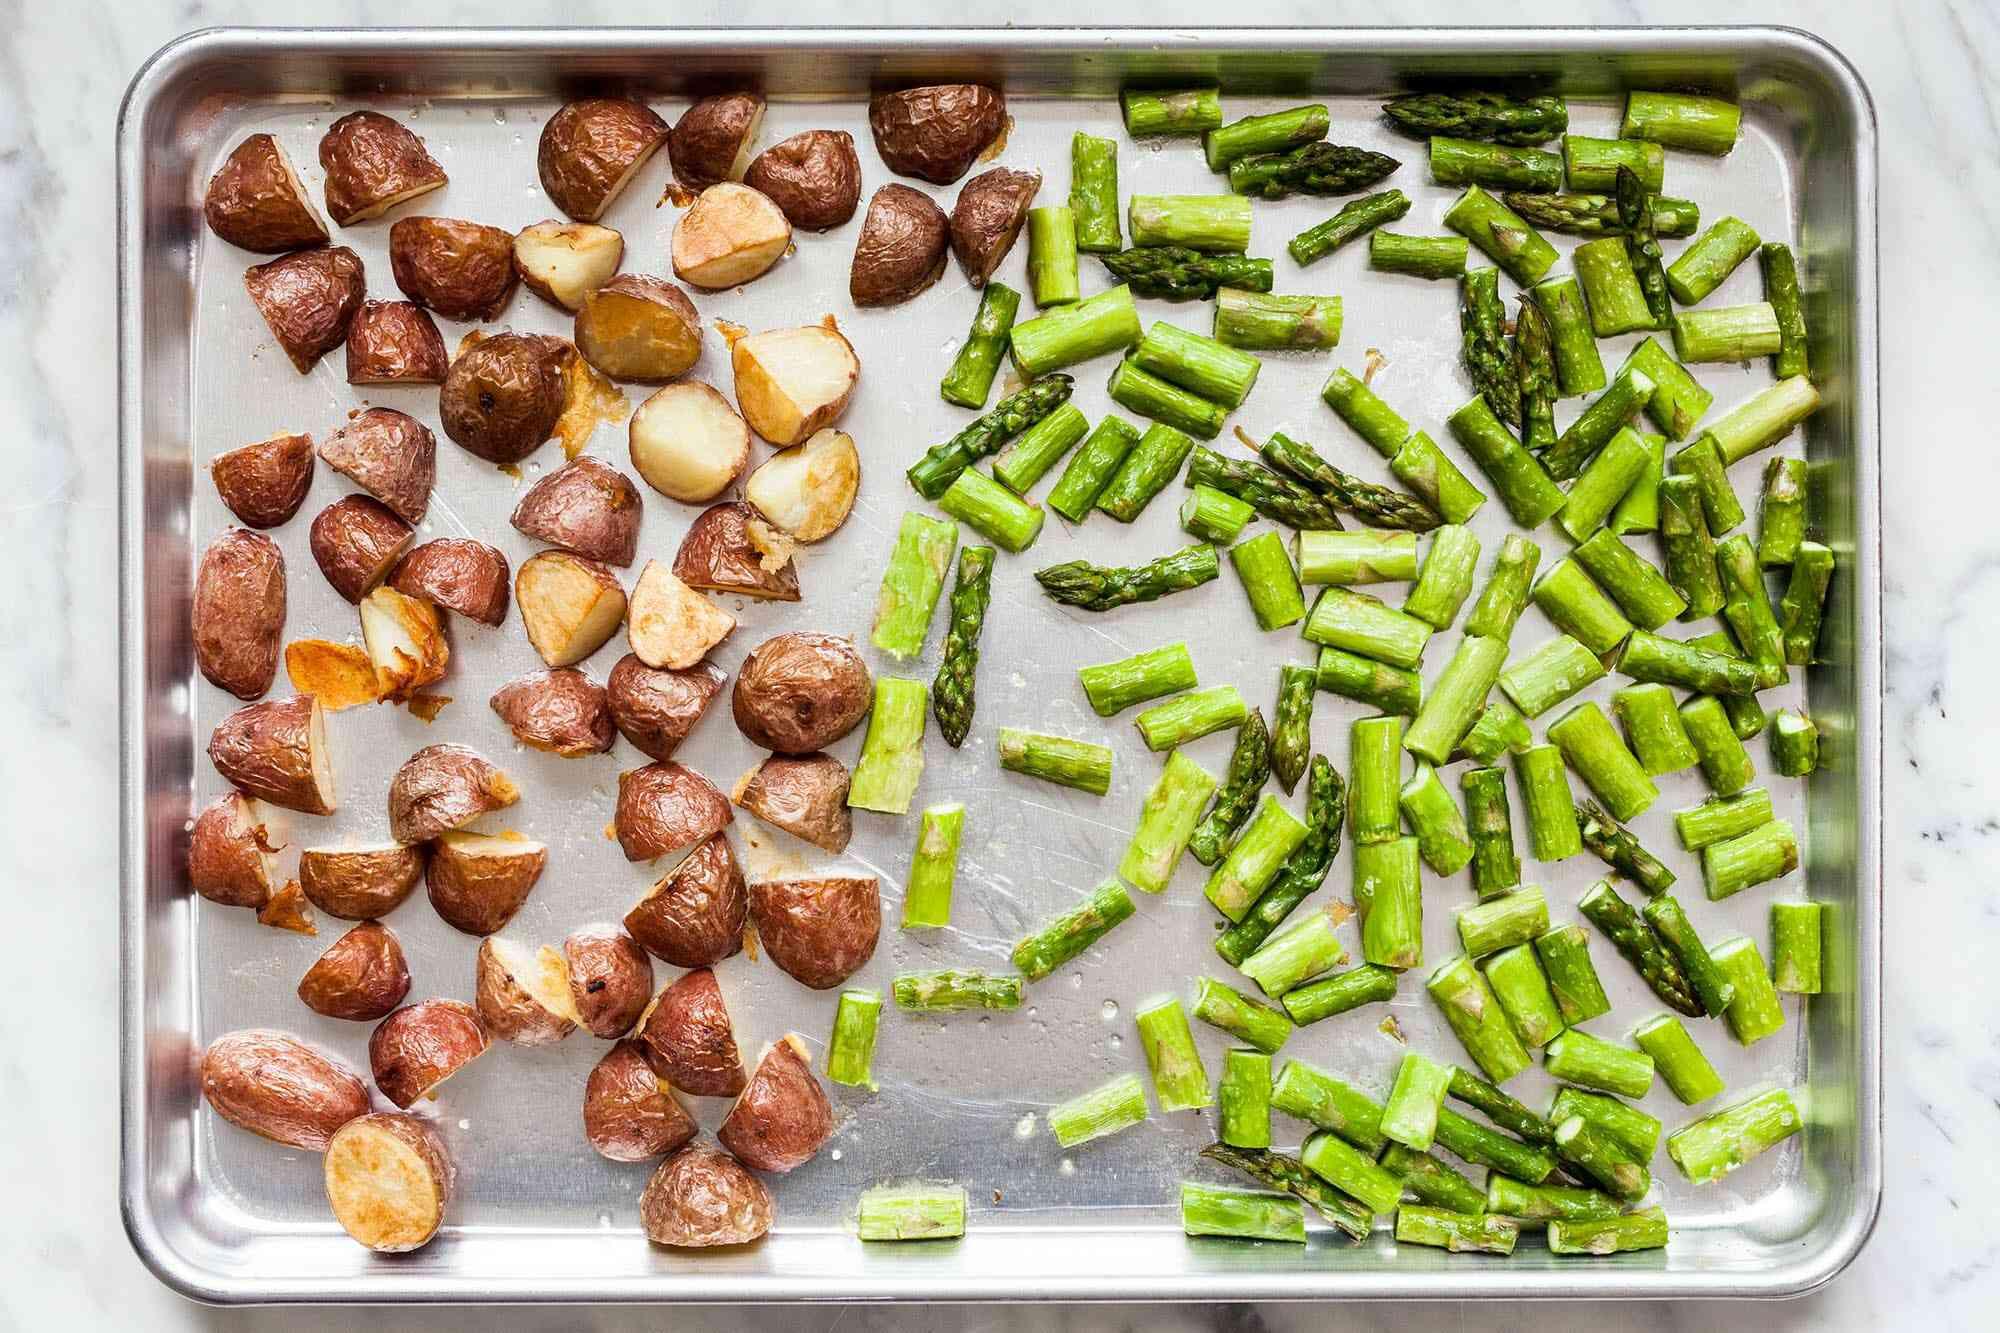 Potatoes and Asparagus Recipe roast the potatoes and asparagus